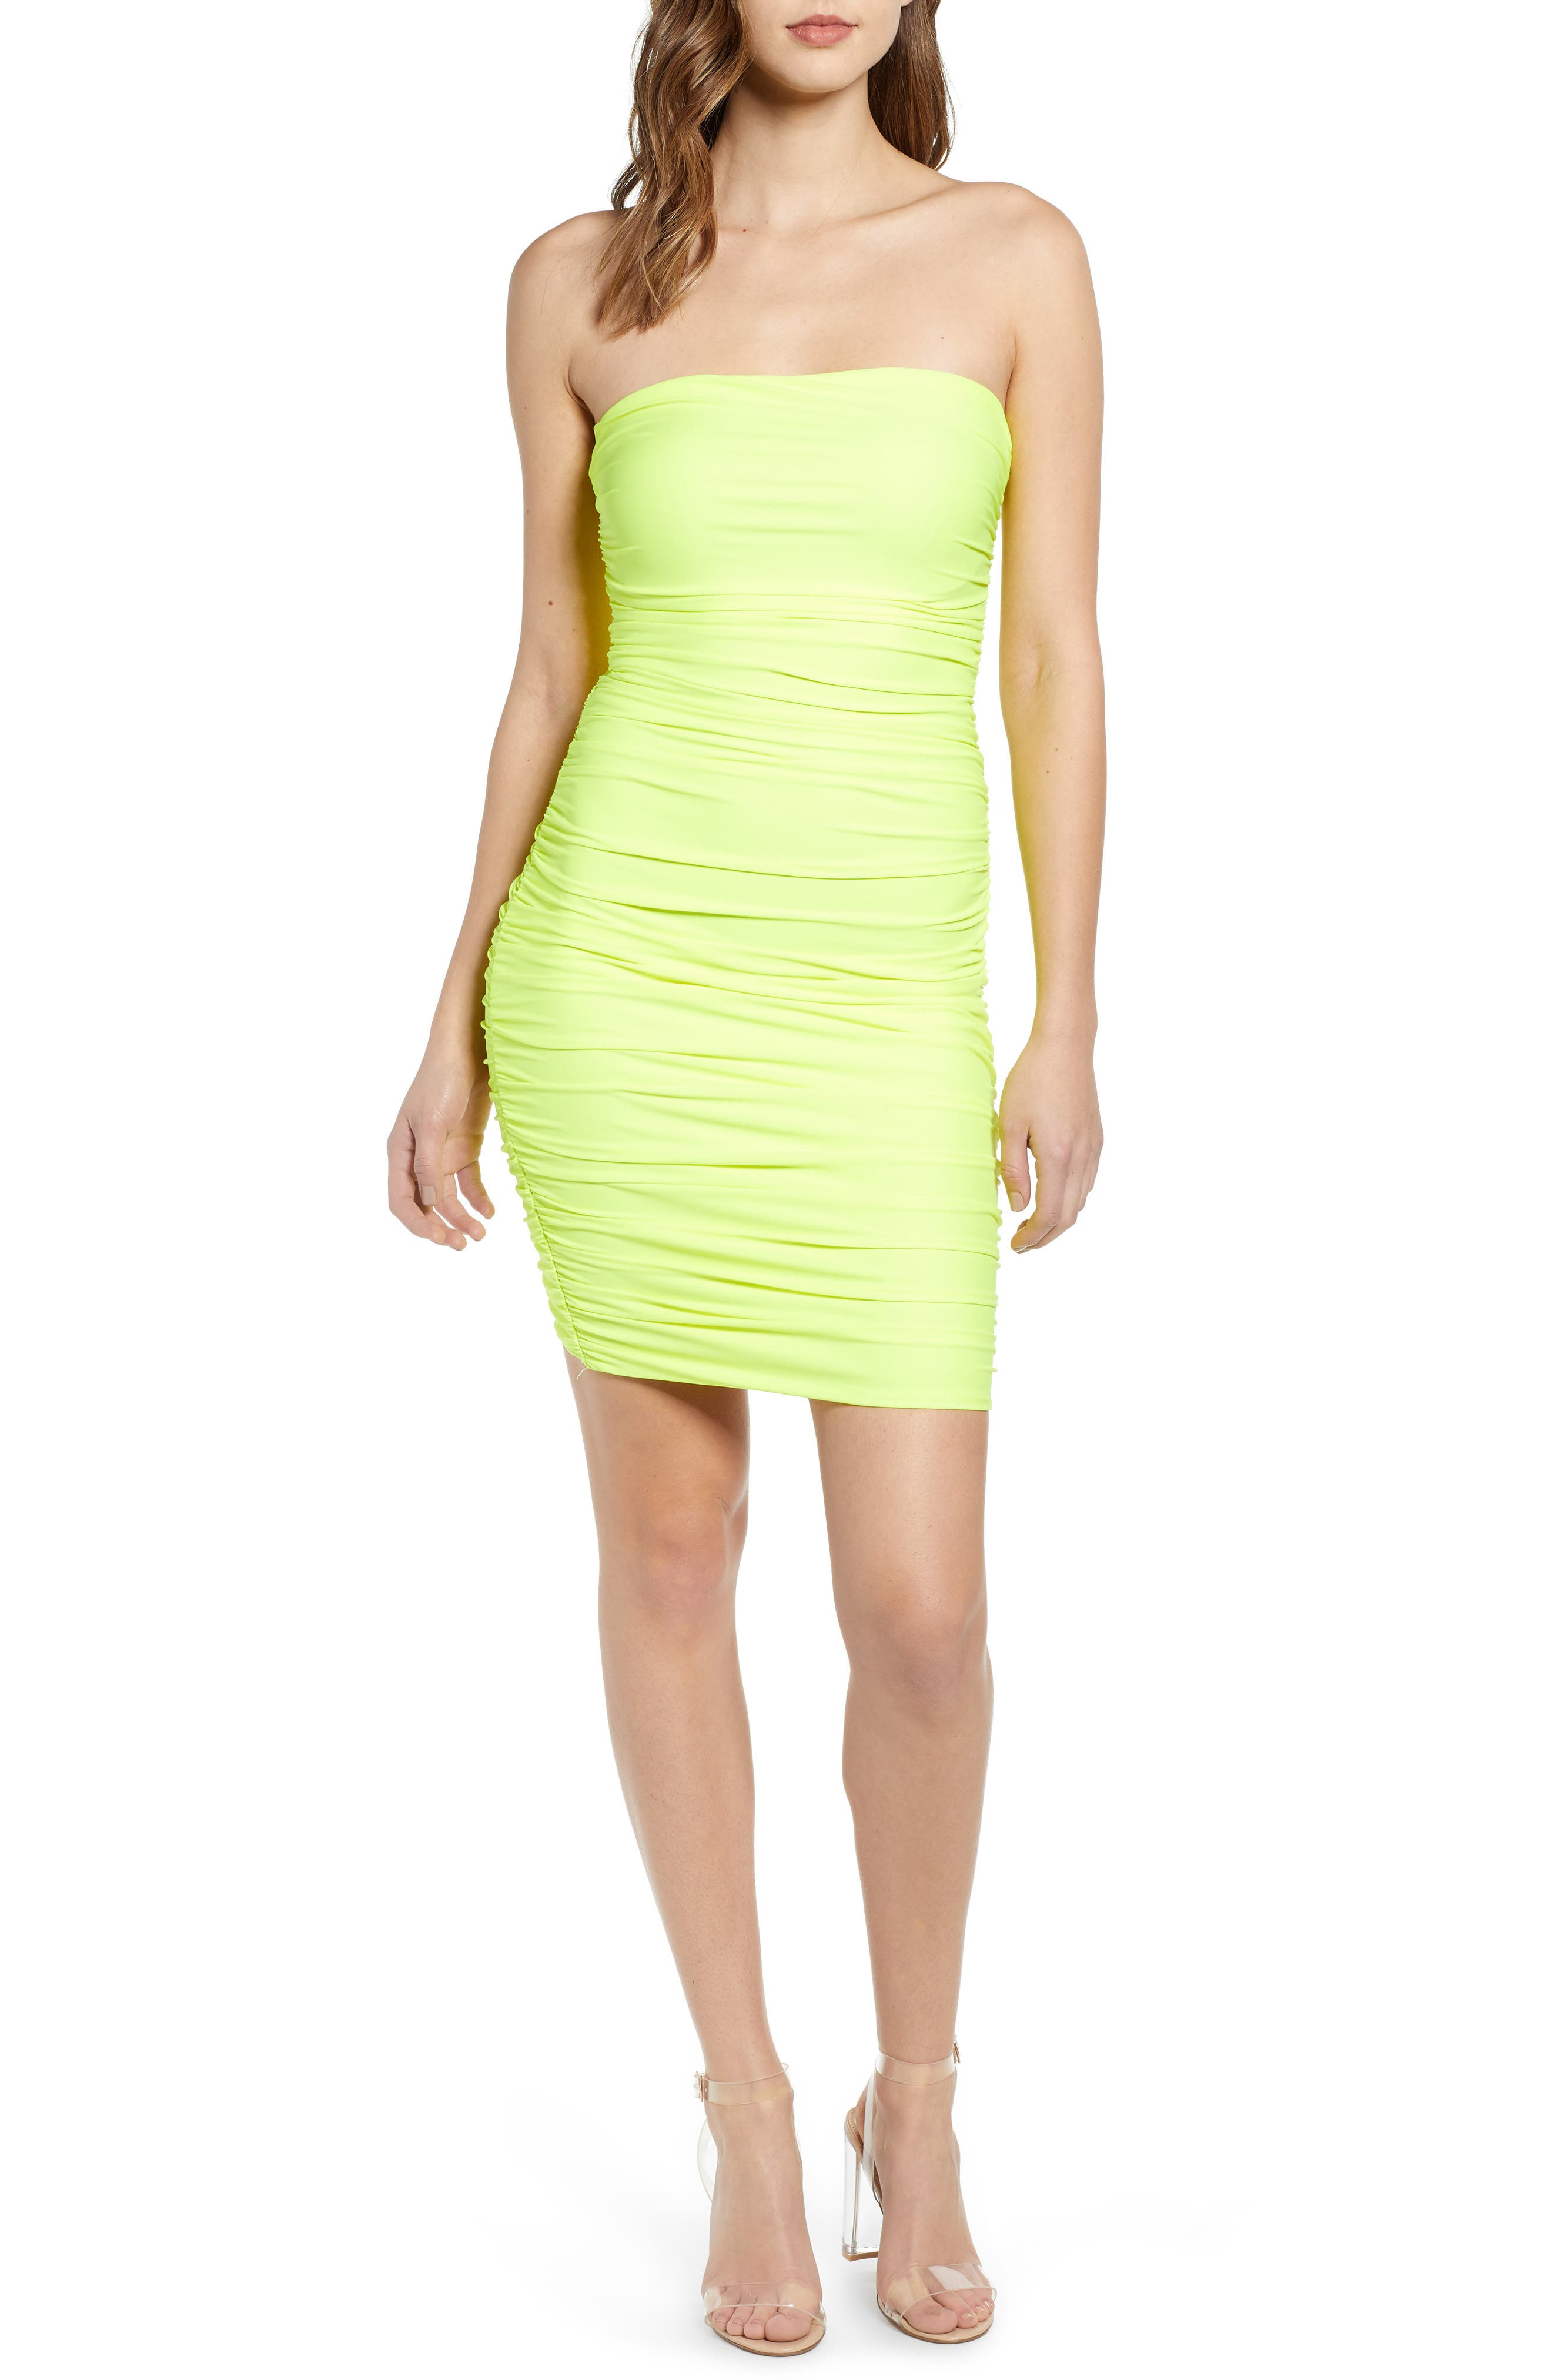 Tiger Mist Keeli Strapless Body-Con Dress, Yellow